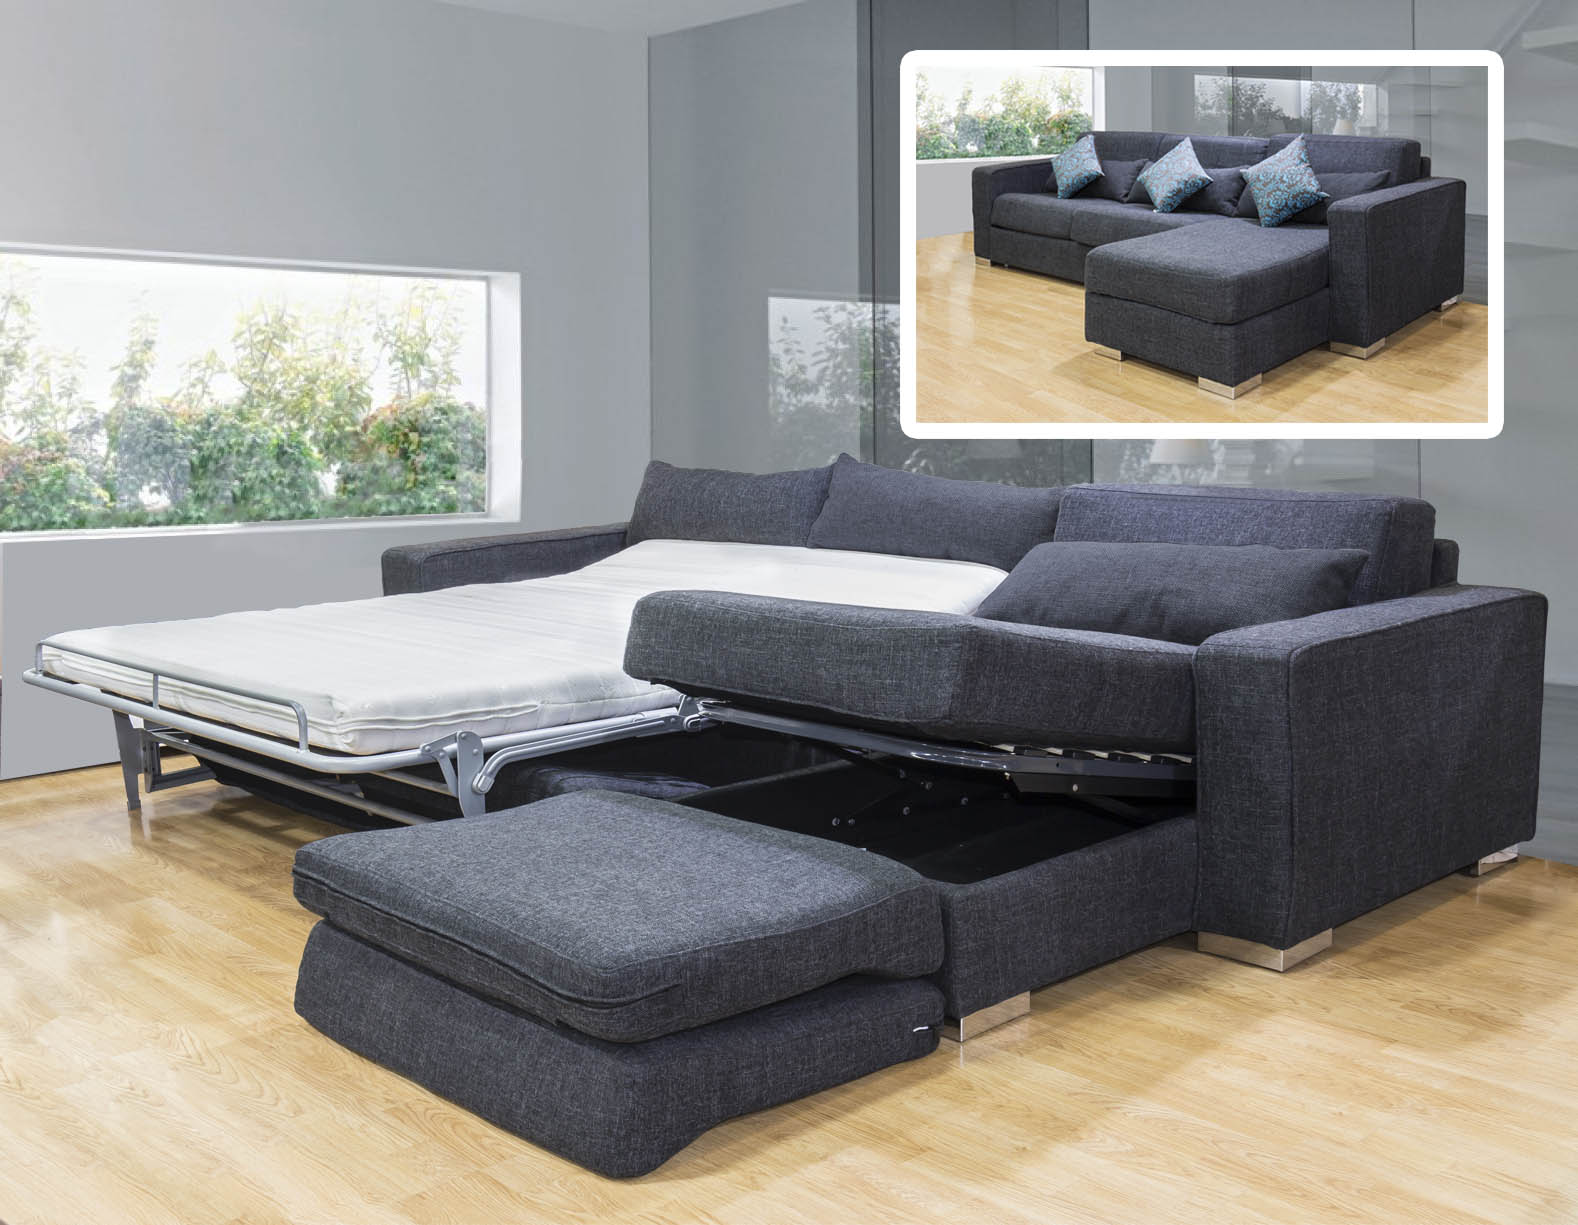 Muebles sofa cama lima 20170830094545 for Cama cama cama